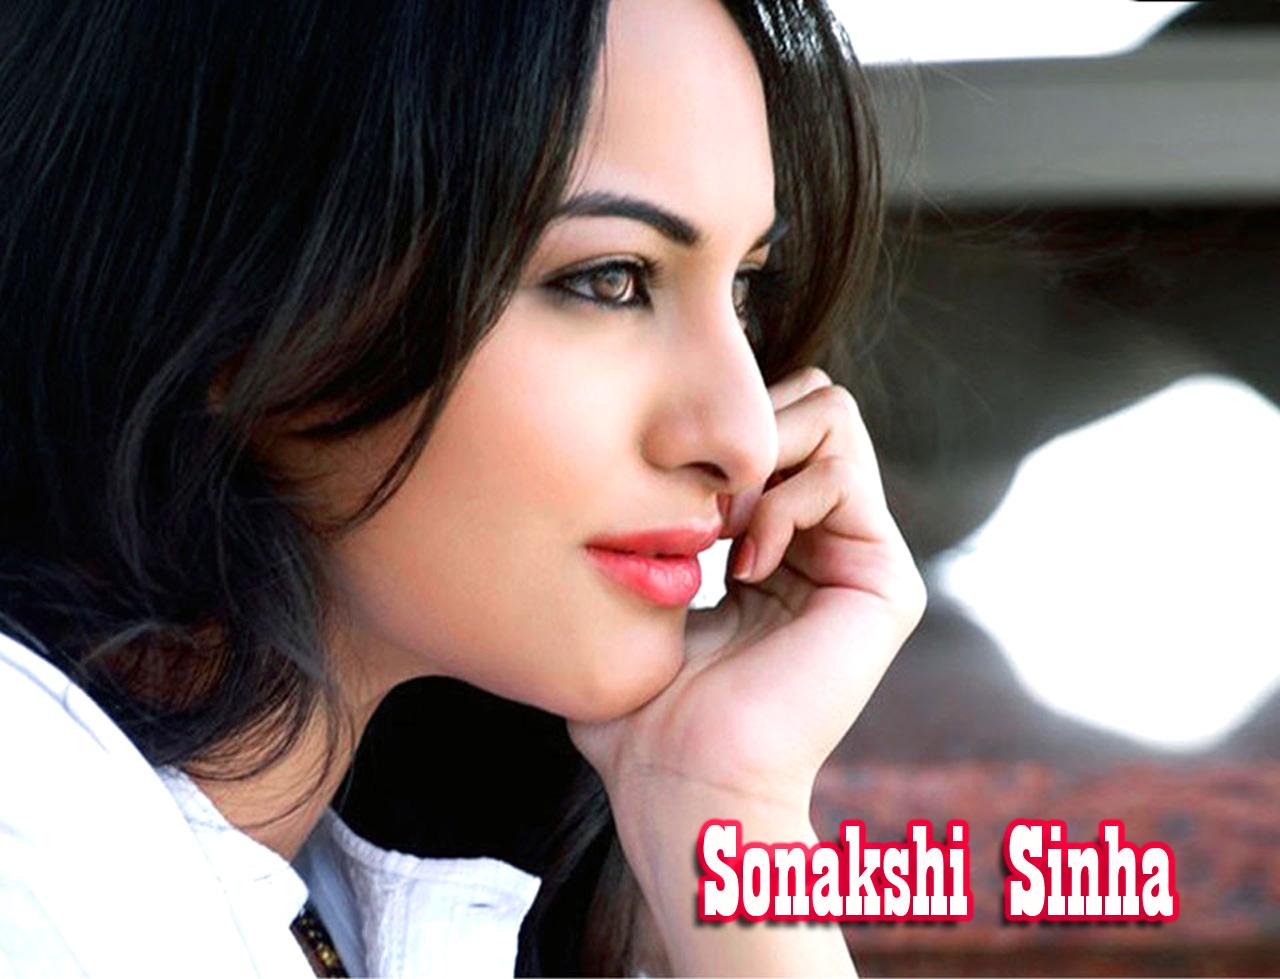 Sonakshi Sinha Cute Wallpaper Free Games Wallpapers Sonakshi Sinha Wallpapers